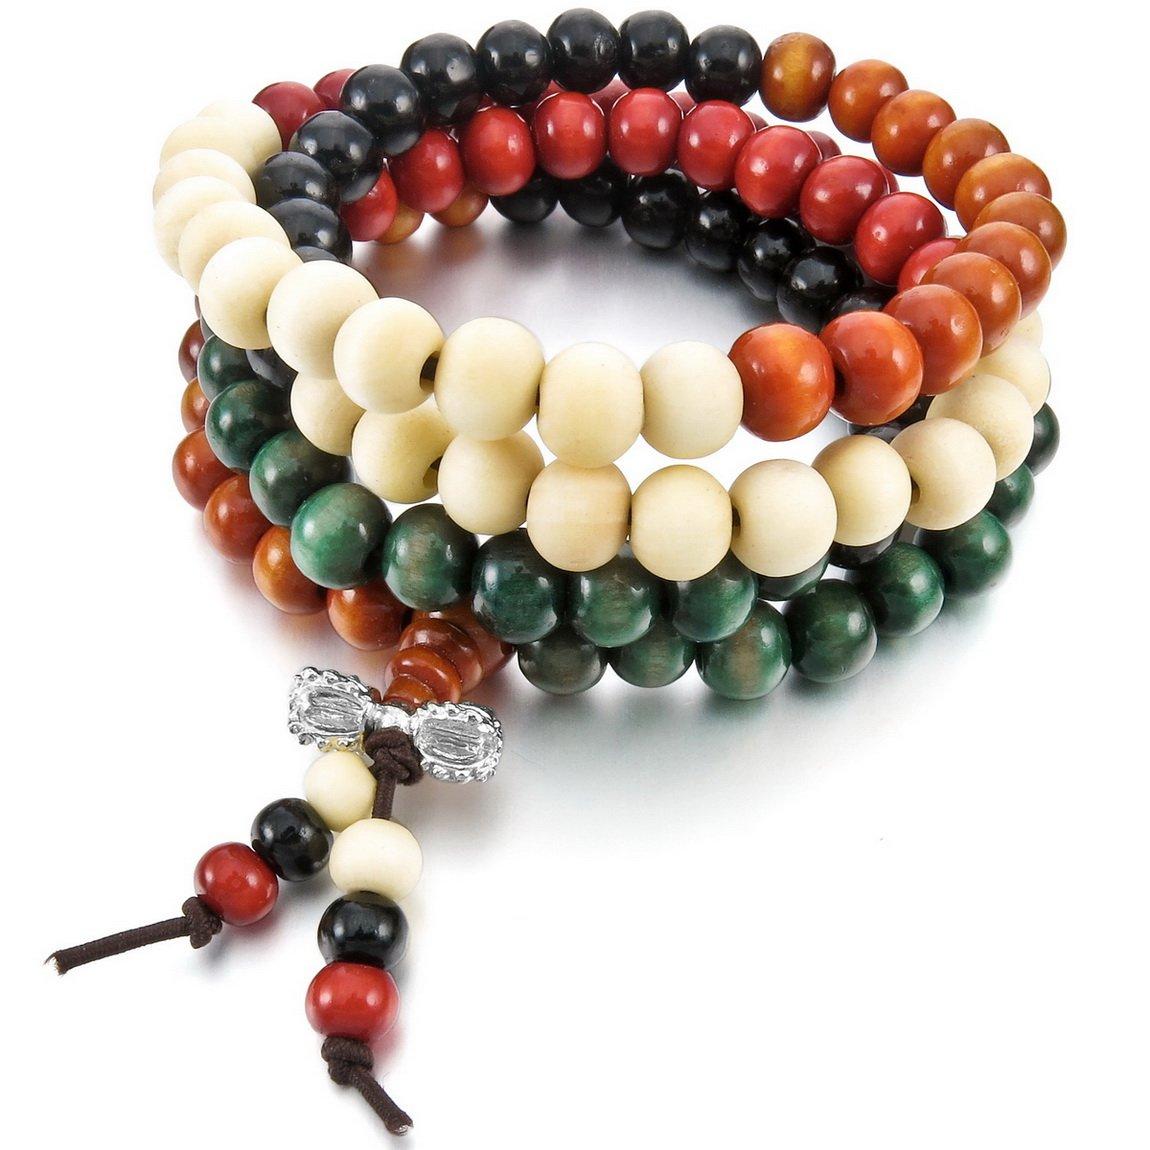 INBLUE Women, Men's 8mm Wood Bracelet Link Wrist Necklace Chain Tibetan Buddhist Colorful Multicolor Sandalwood Bead Prayer Buddha Mala Elastic INBLUE Jewelry mnb1053